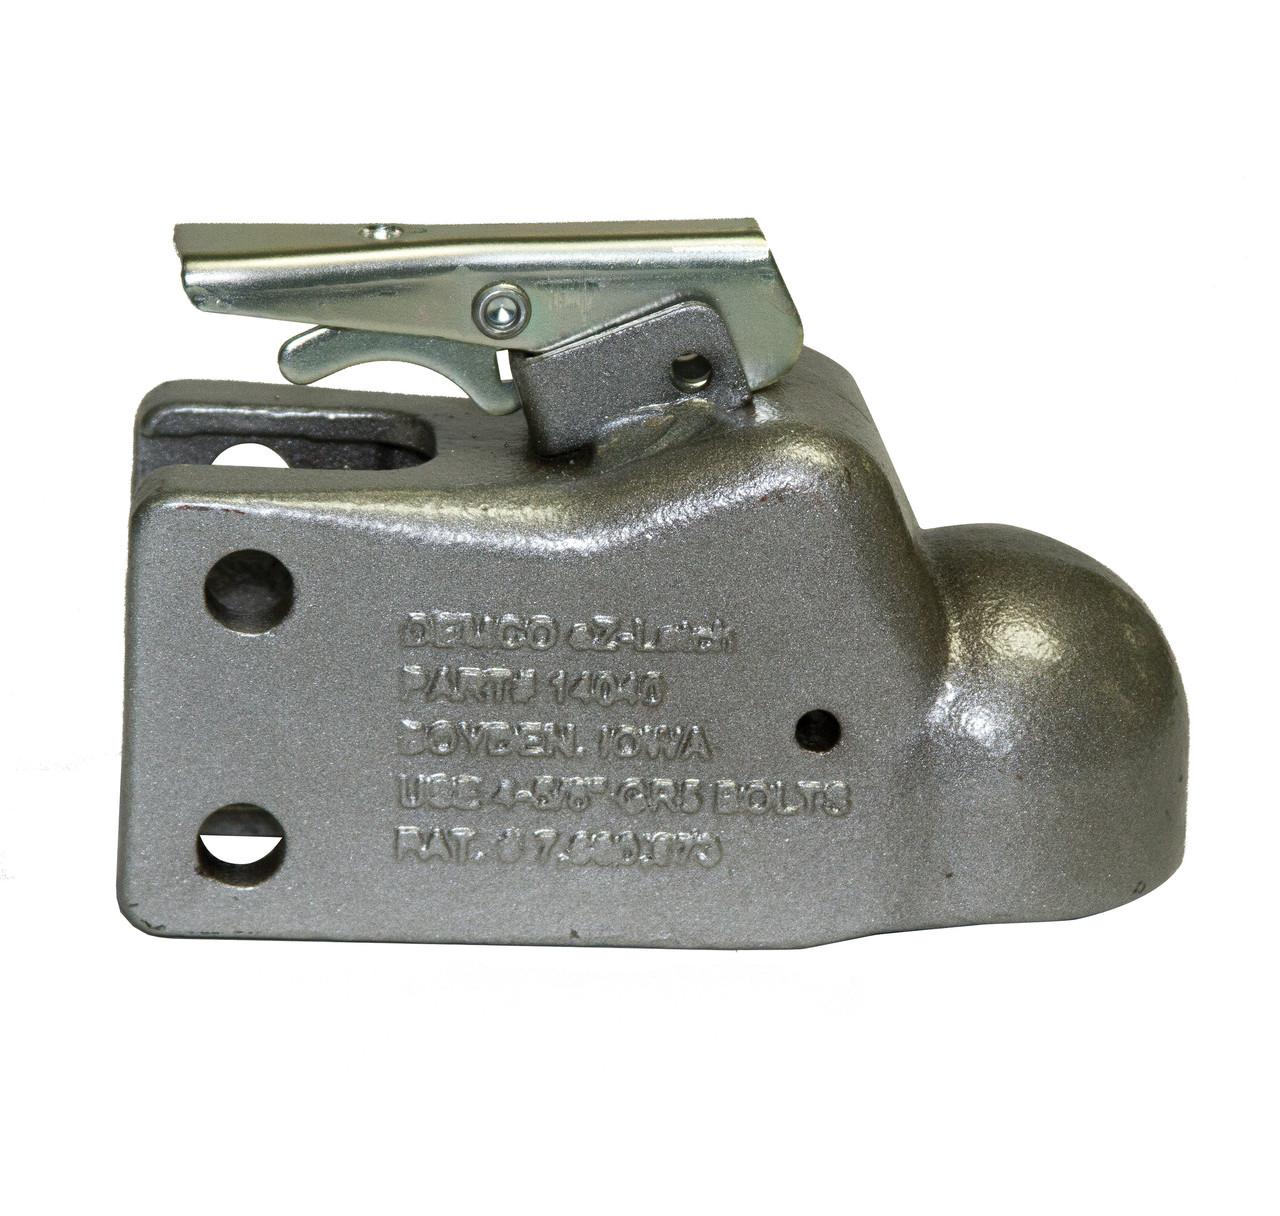 "15791-52 --- Demco Adjustable Coupler - 21,000 lbs Capacity - 2-5/16"" - Silver"